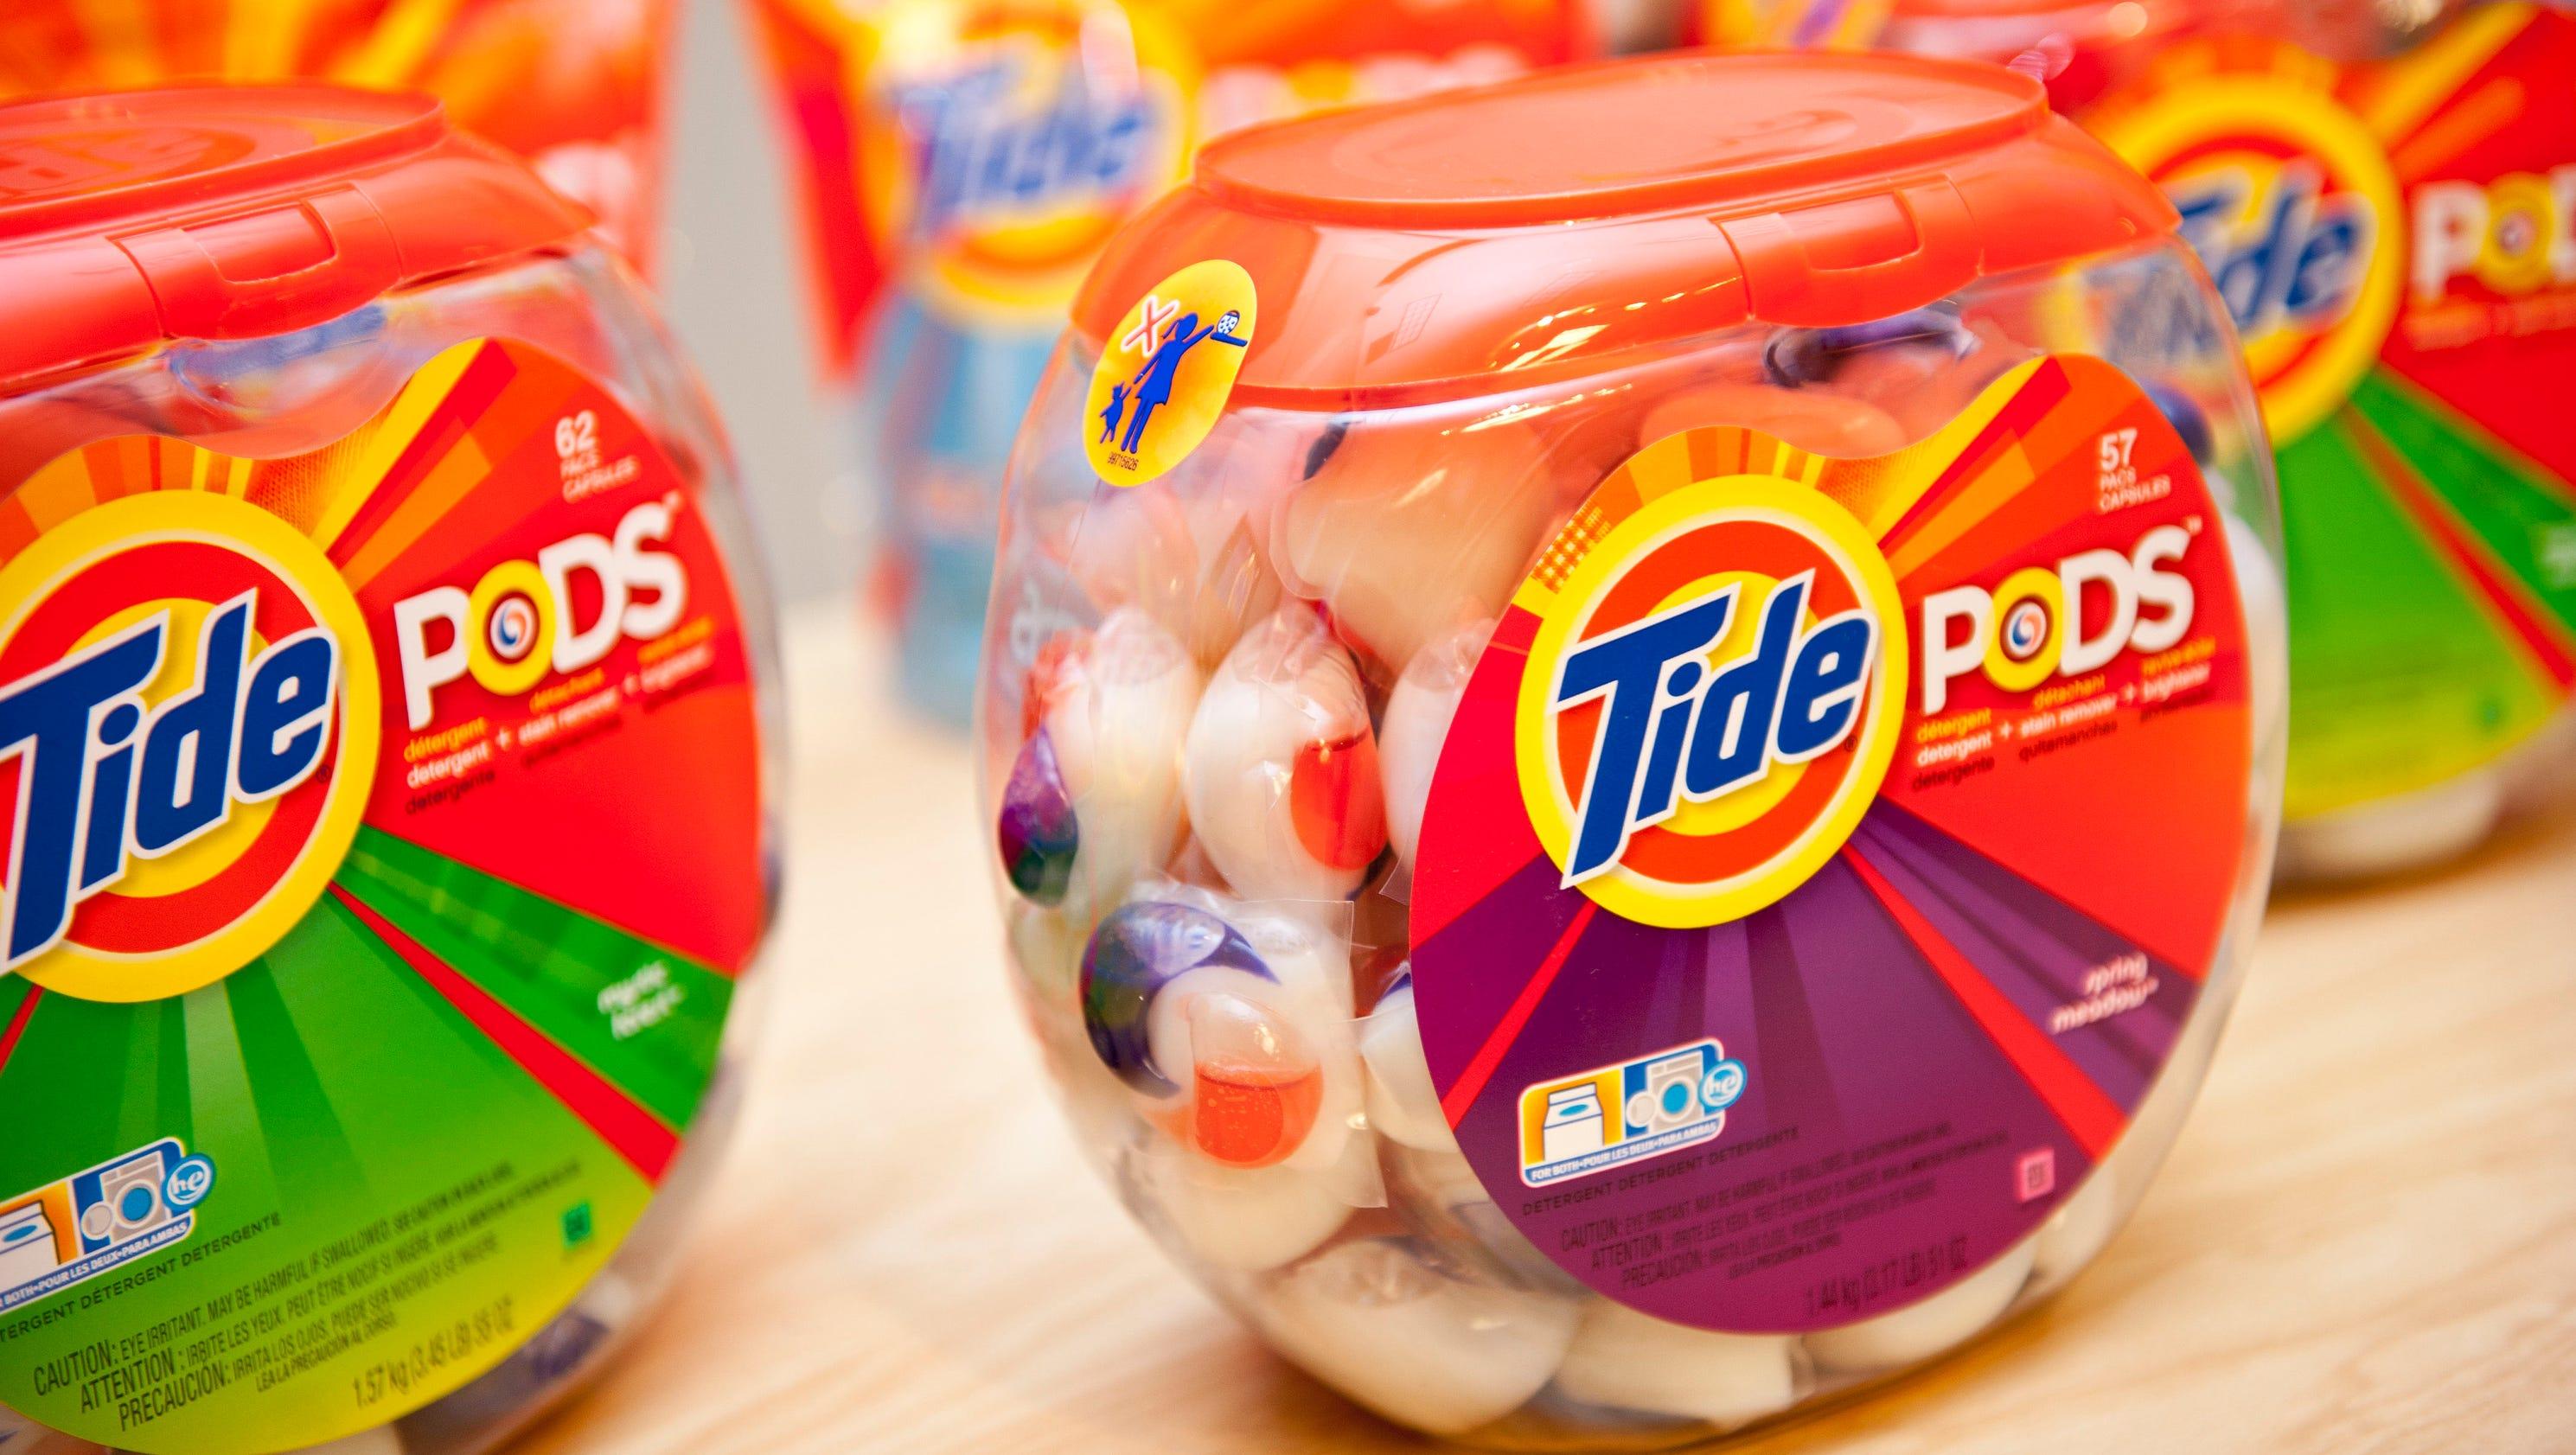 Tide Pod Challenge Teens Eat Detergent Pods Post